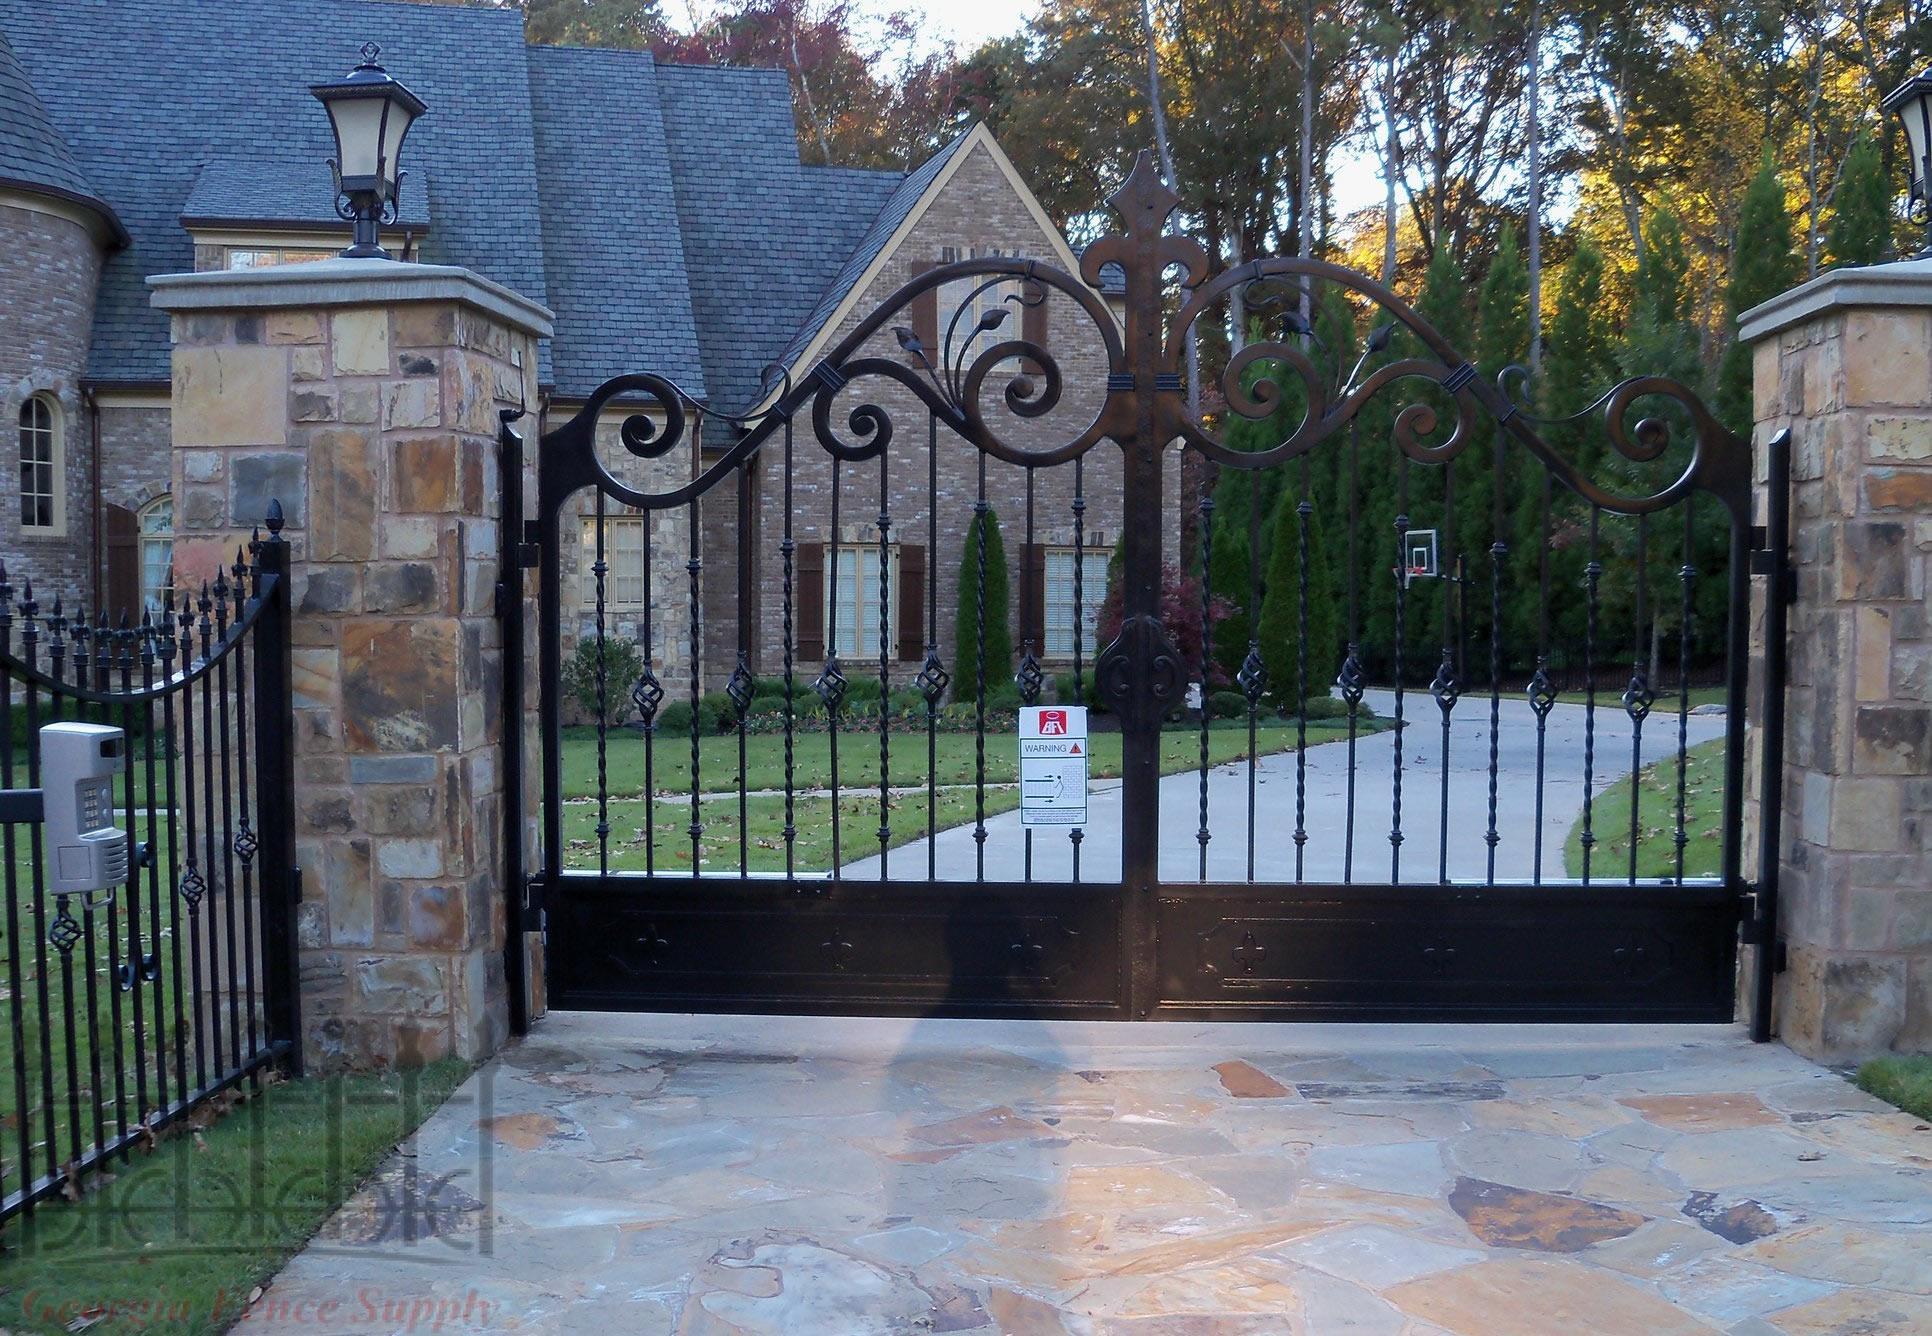 Georgia Gate Products